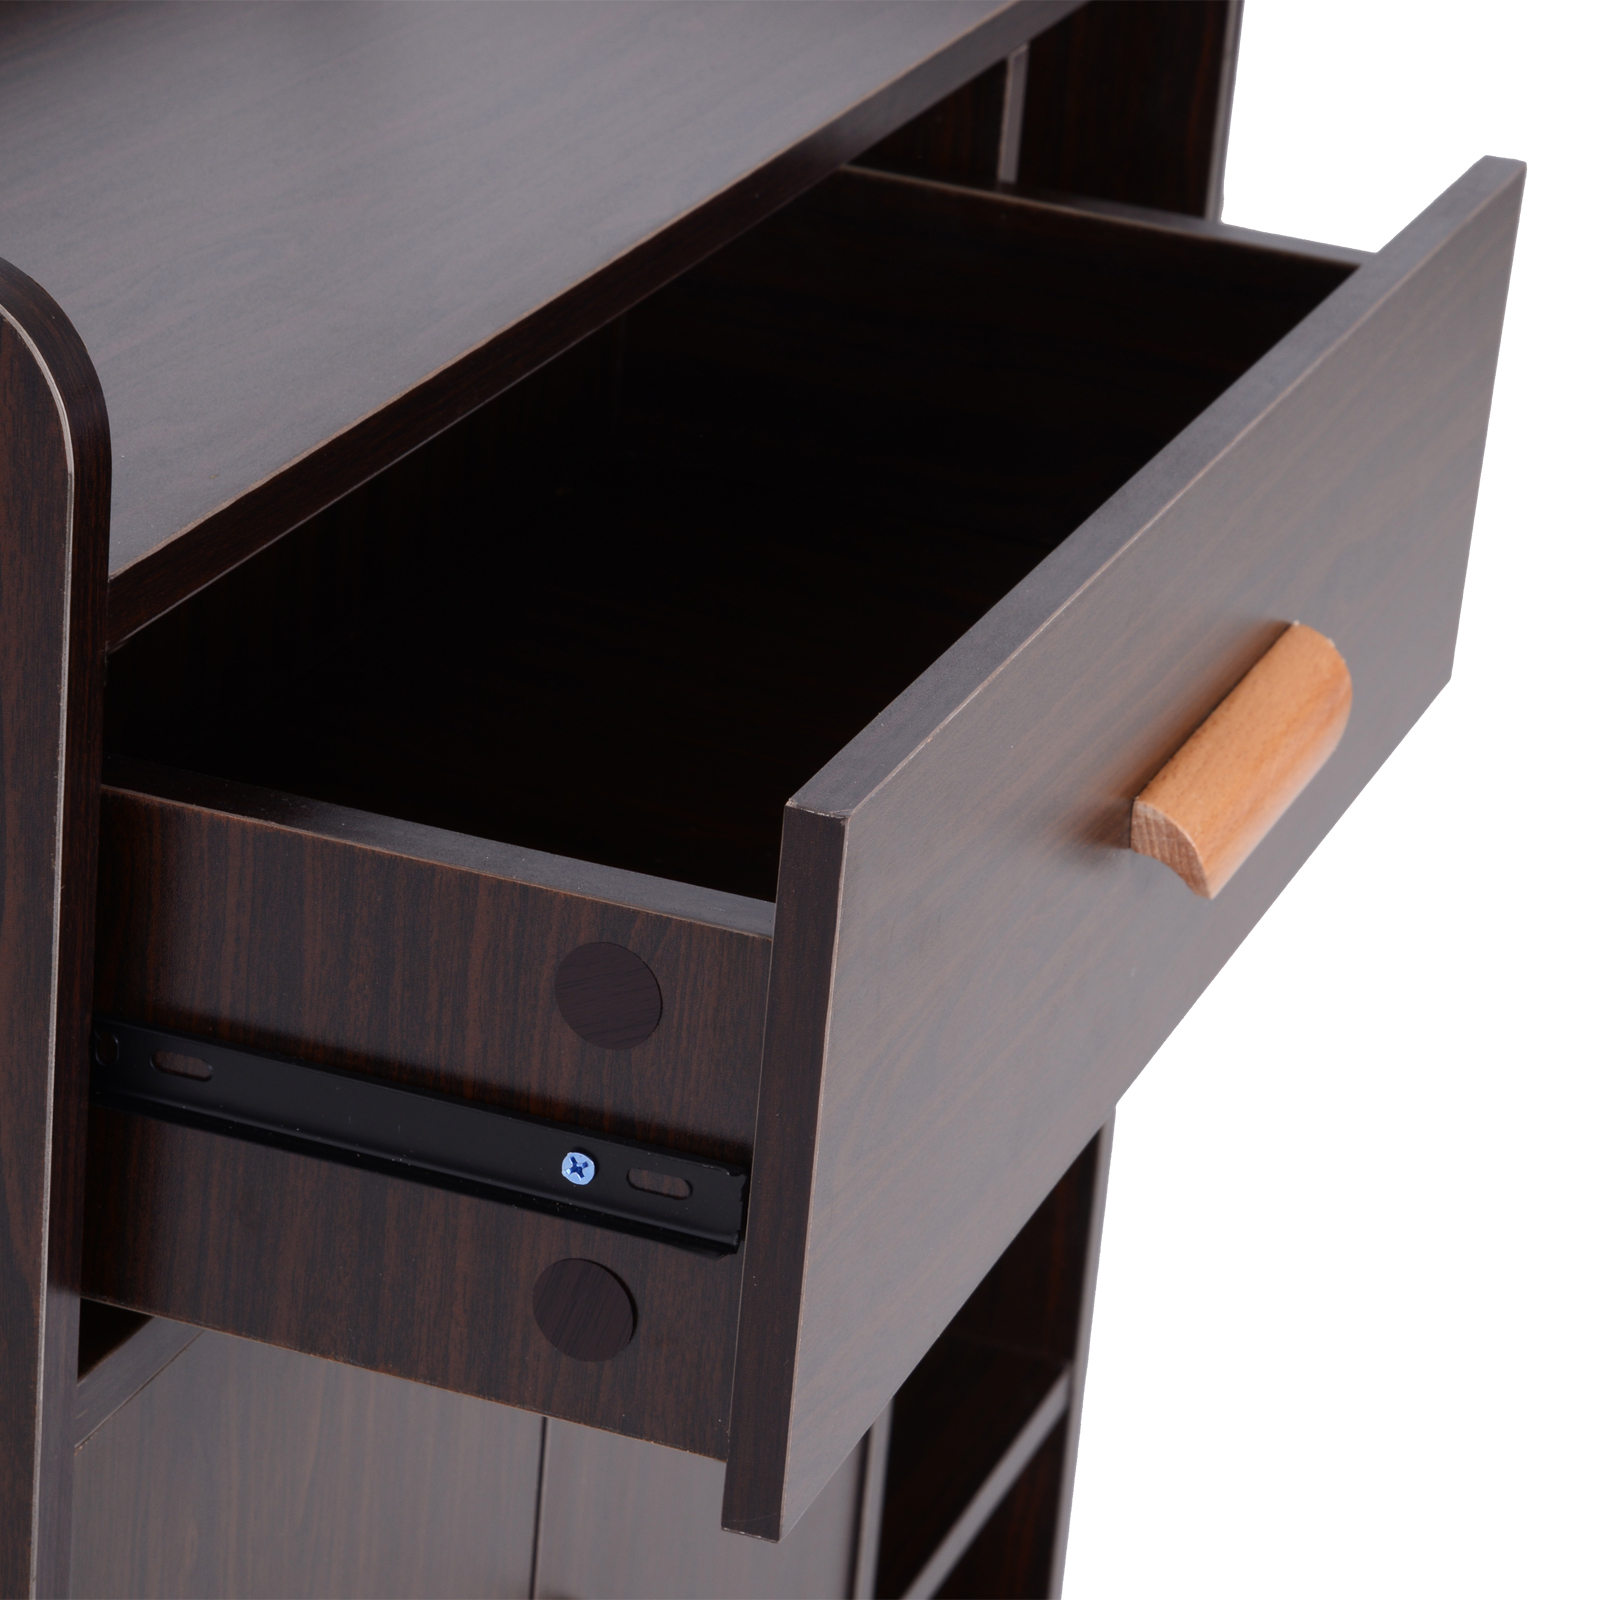 thumbnail 9 - Side-Cabinet-Hallway-Storage-Unit-Console-Table-Entrance-Shelf-Cupboard-2-color